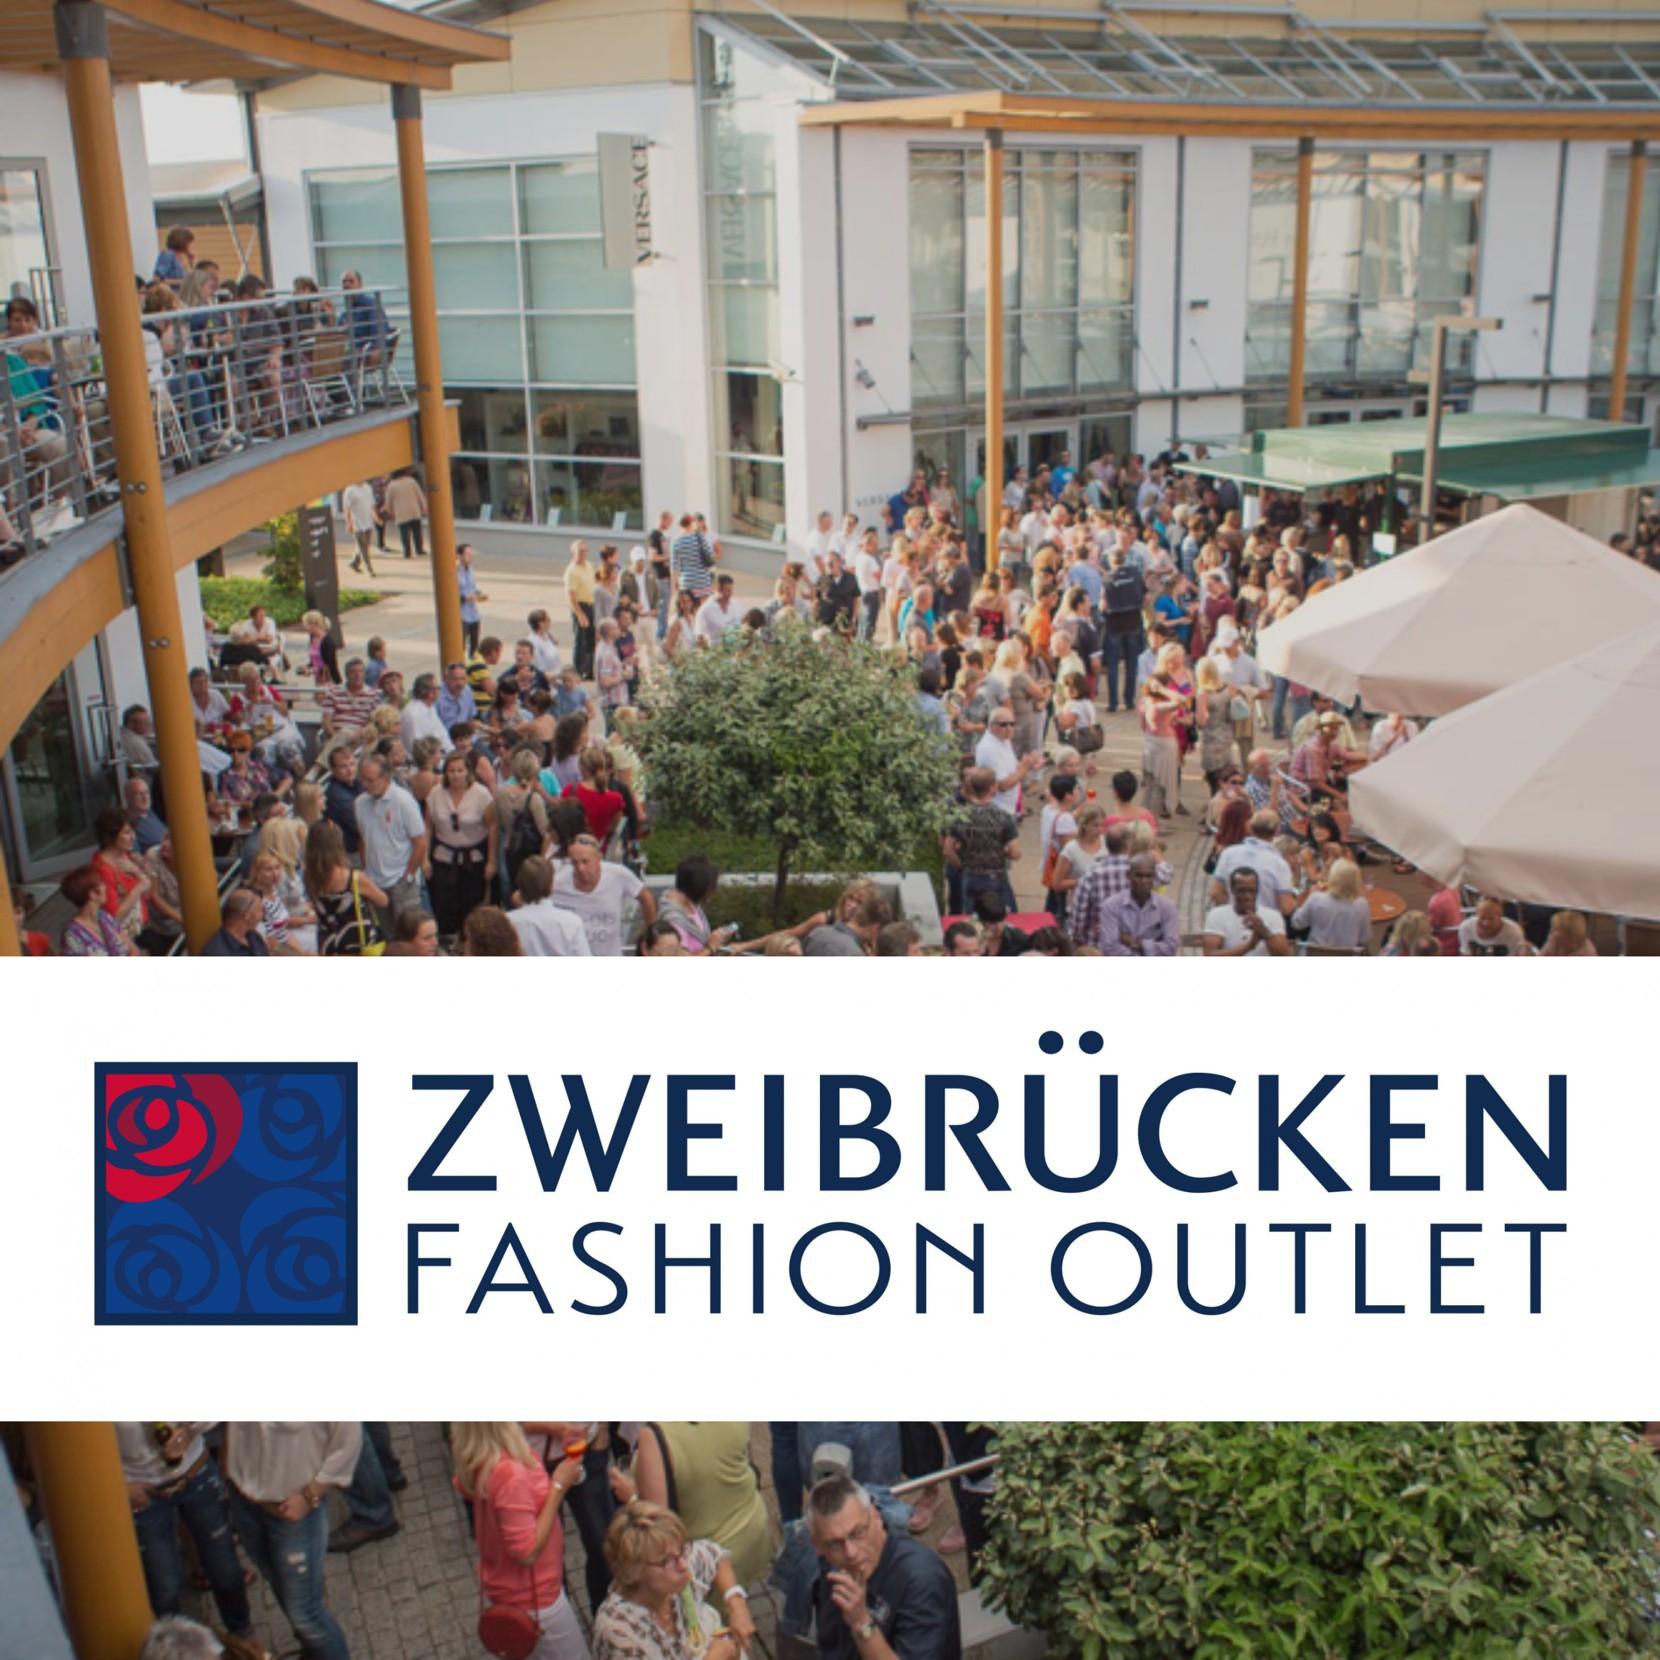 Zweibrücken Fashion Outlet | Zweibrücken Fashion Outlet